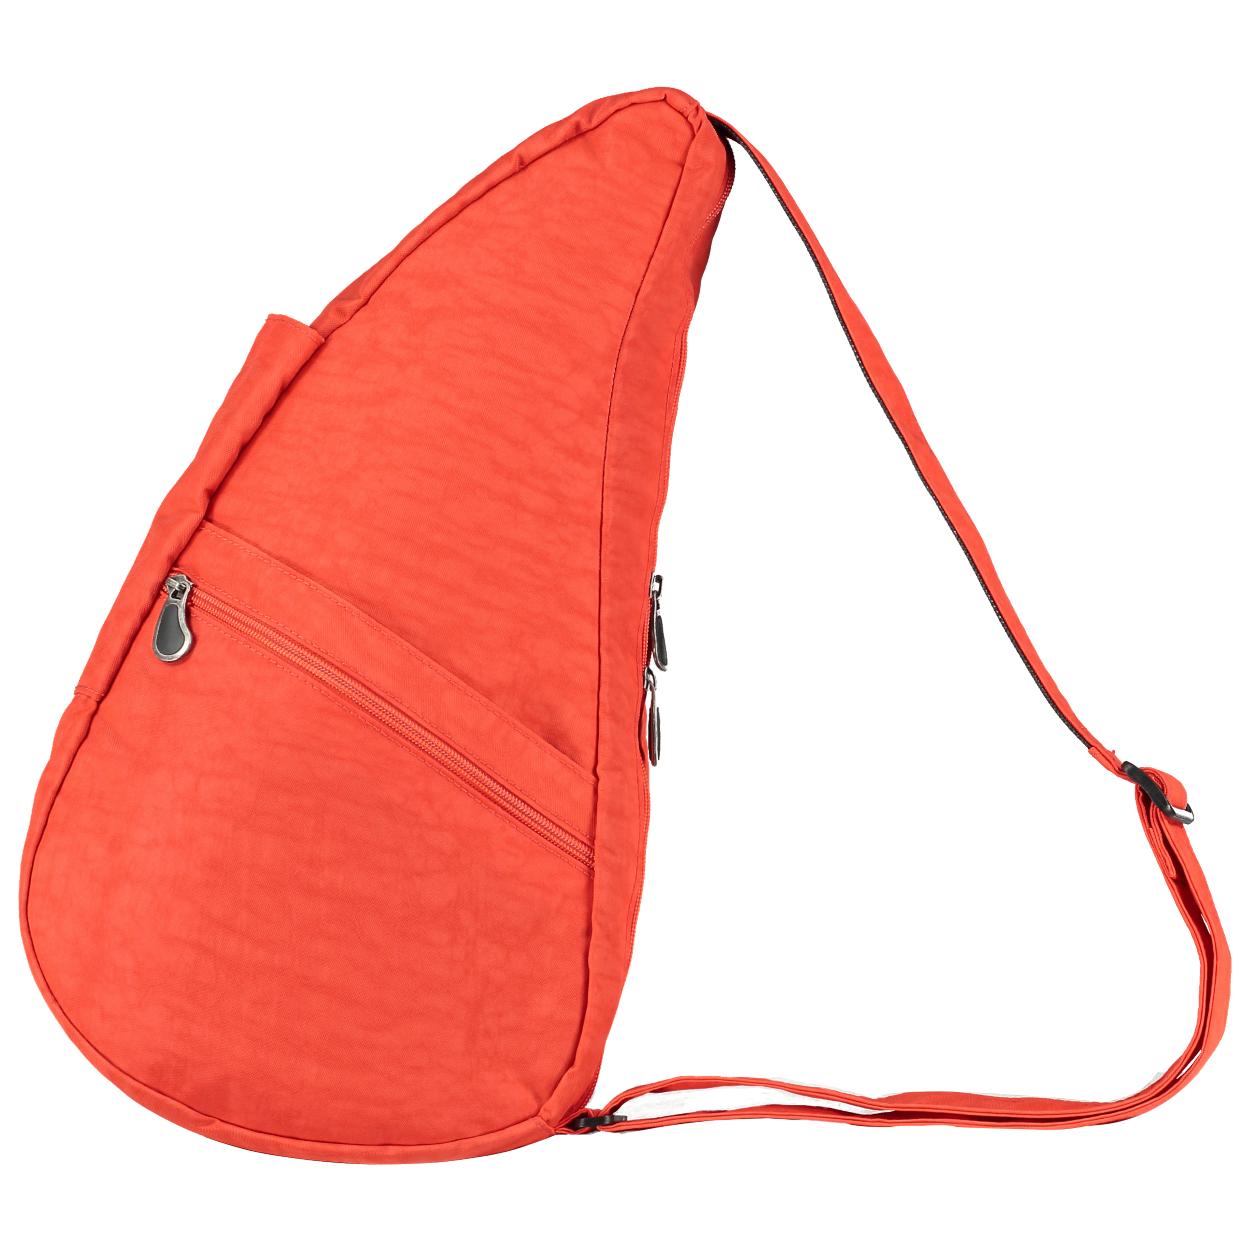 Healthy Back Bag 6303 Textured Nylon Persimmon S